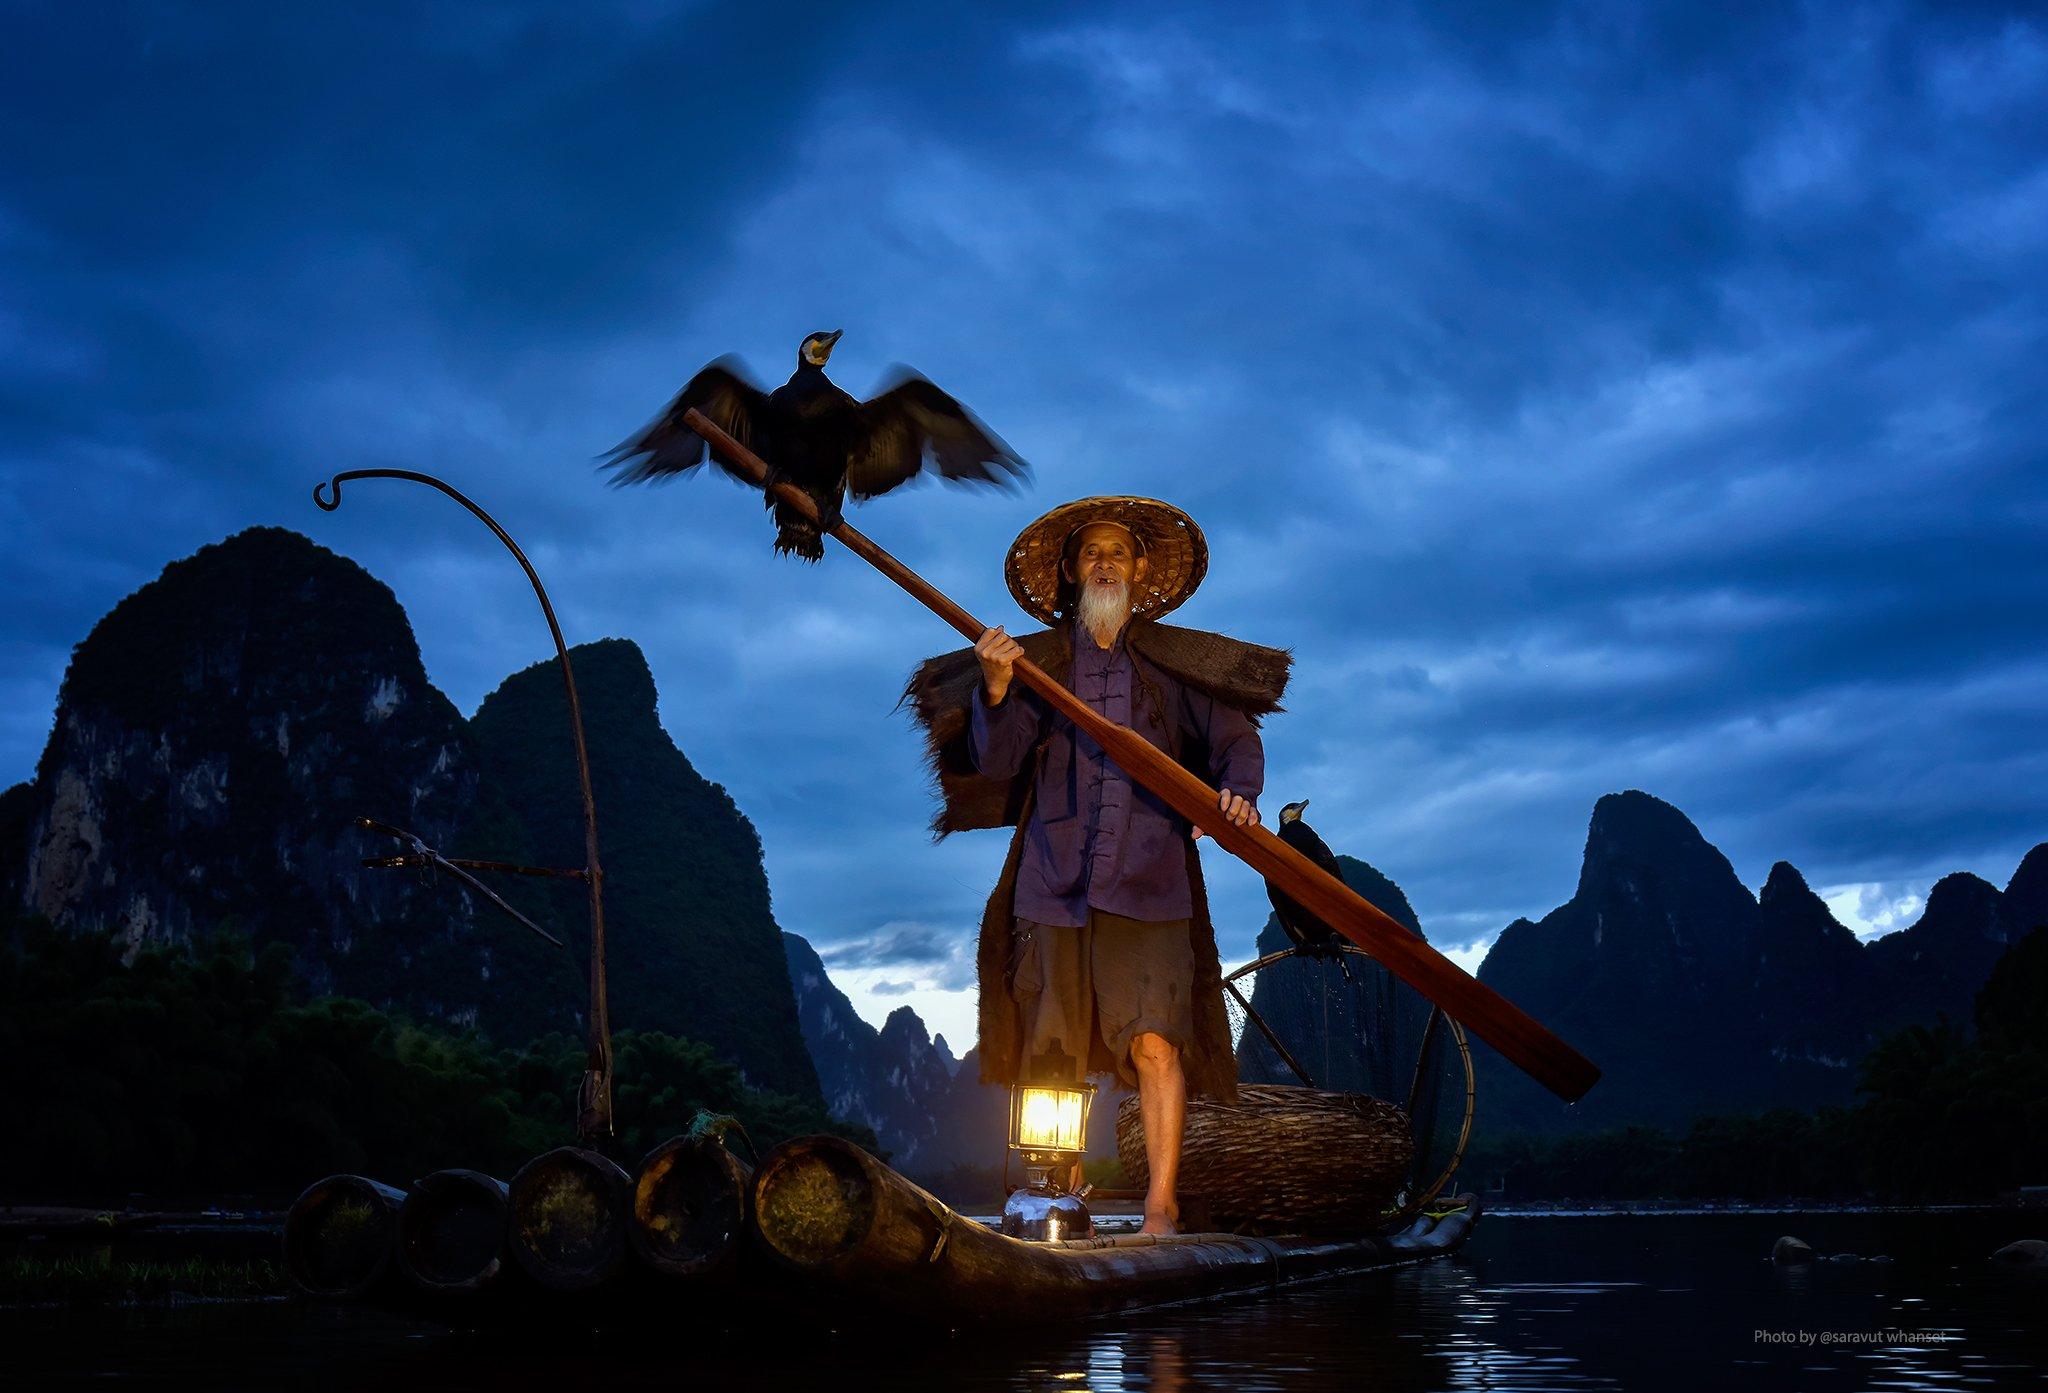 China, Fisherman, Fishing, River, Saravut Whanset